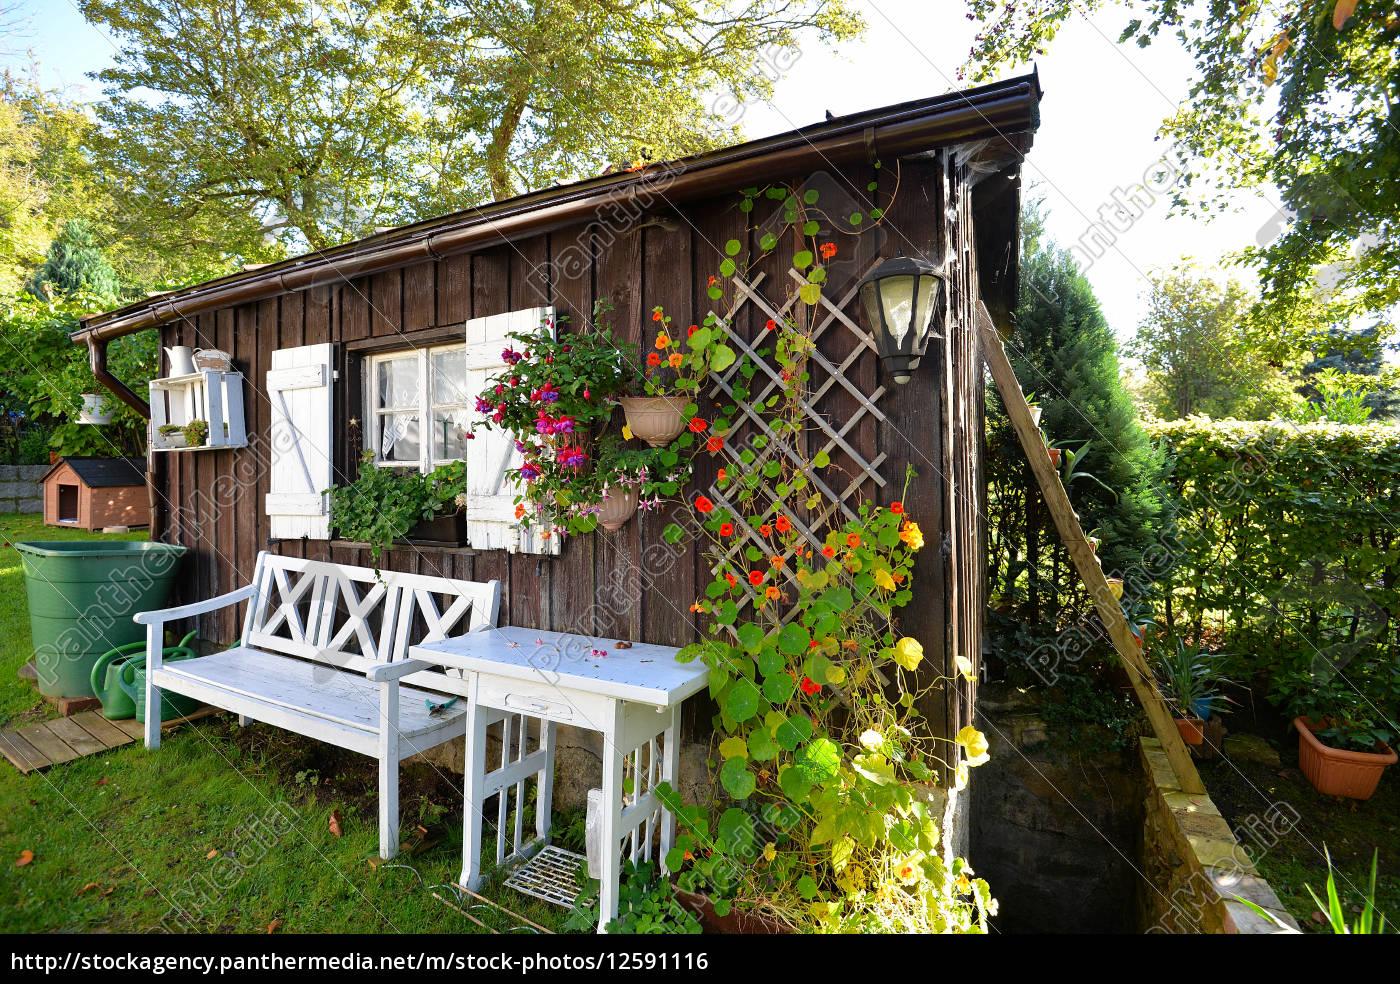 Garten Hütte Herbst Lizenzfreies Foto 12591116 Bildagentur